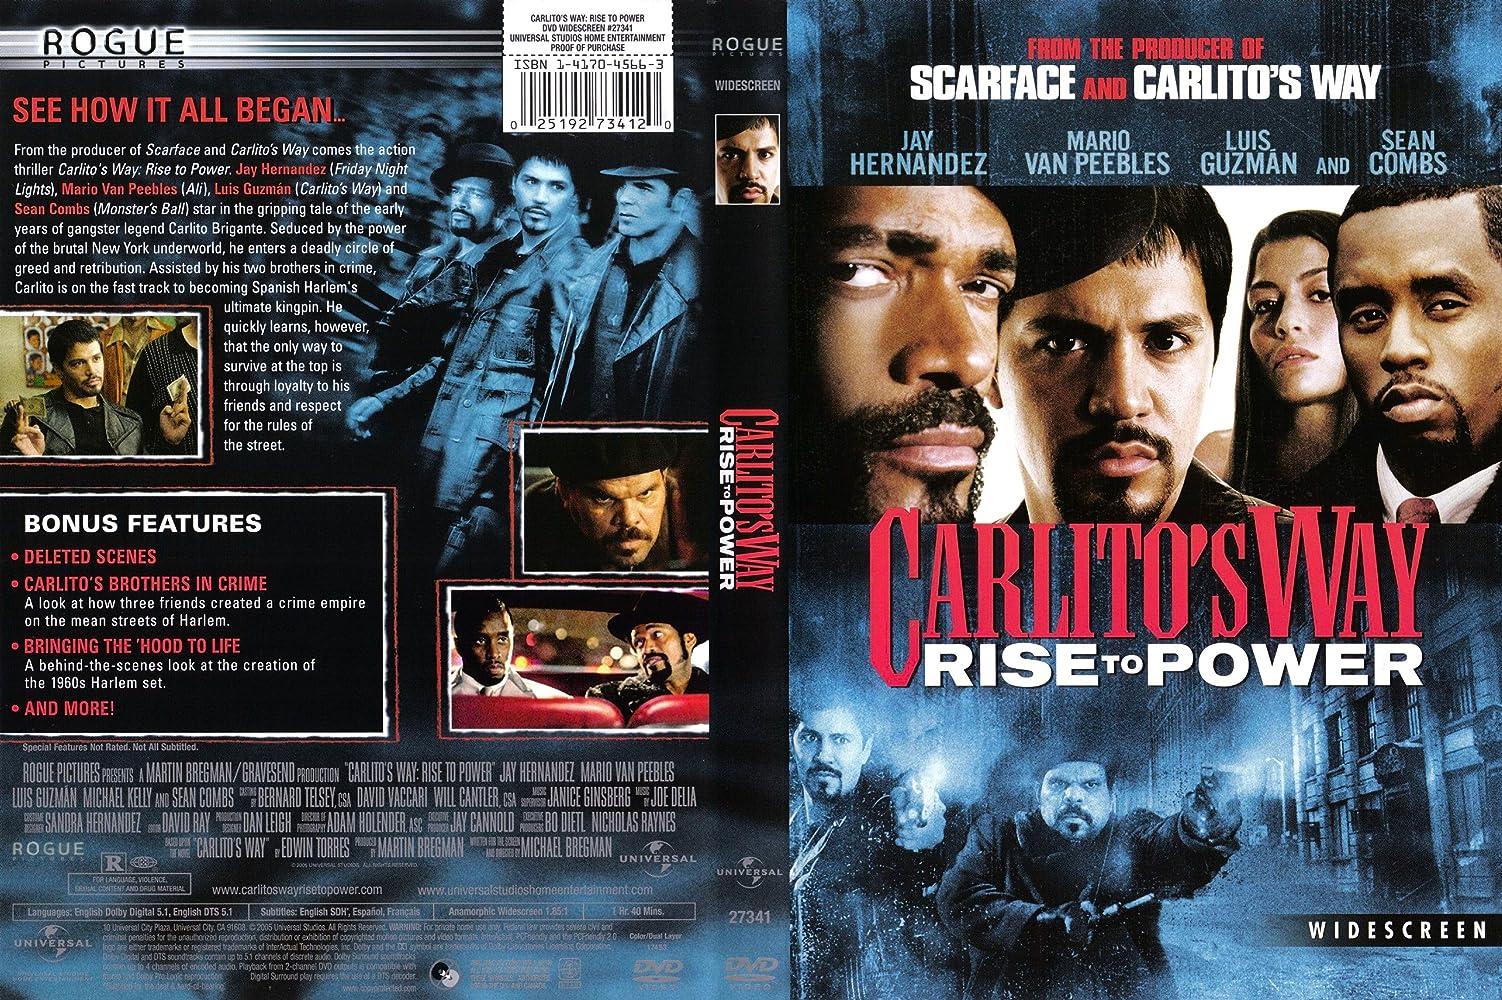 Carlito's Way: Rise to Power (2005)